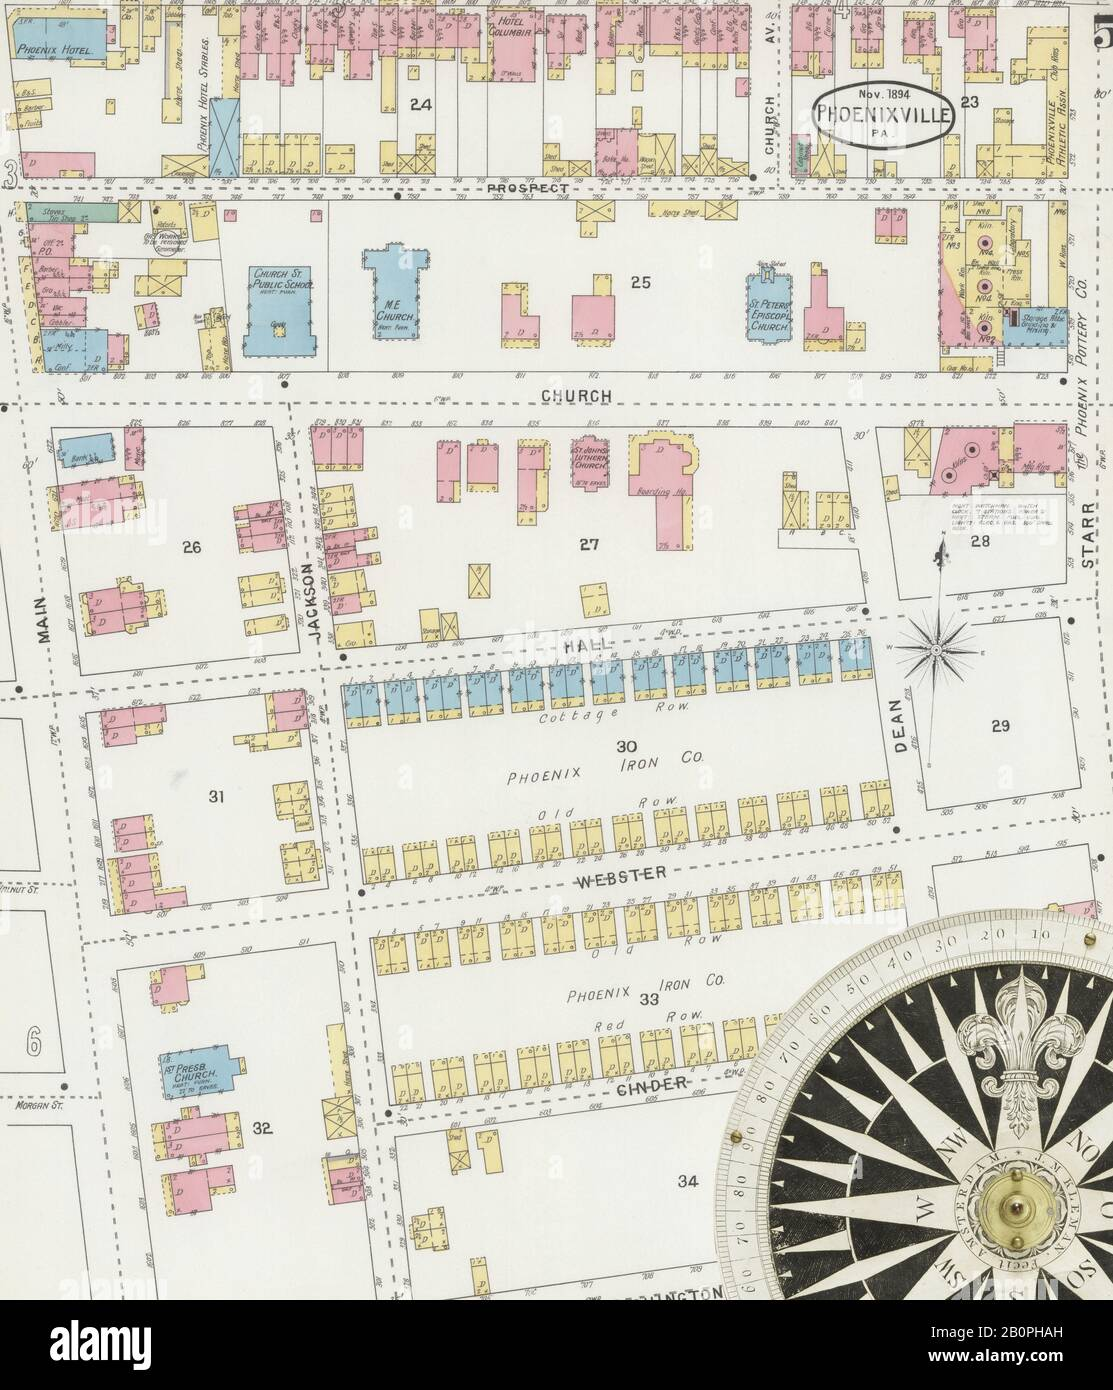 Bild 5 von Sanborn Fire Insurance Map aus Phoenix, Chester County, Pennsylvania. Nov. 1894. 10 Blatt(e), Amerika, Straßenkarte mit einem Kompass Aus Dem 19. Jahrhundert Stockfoto